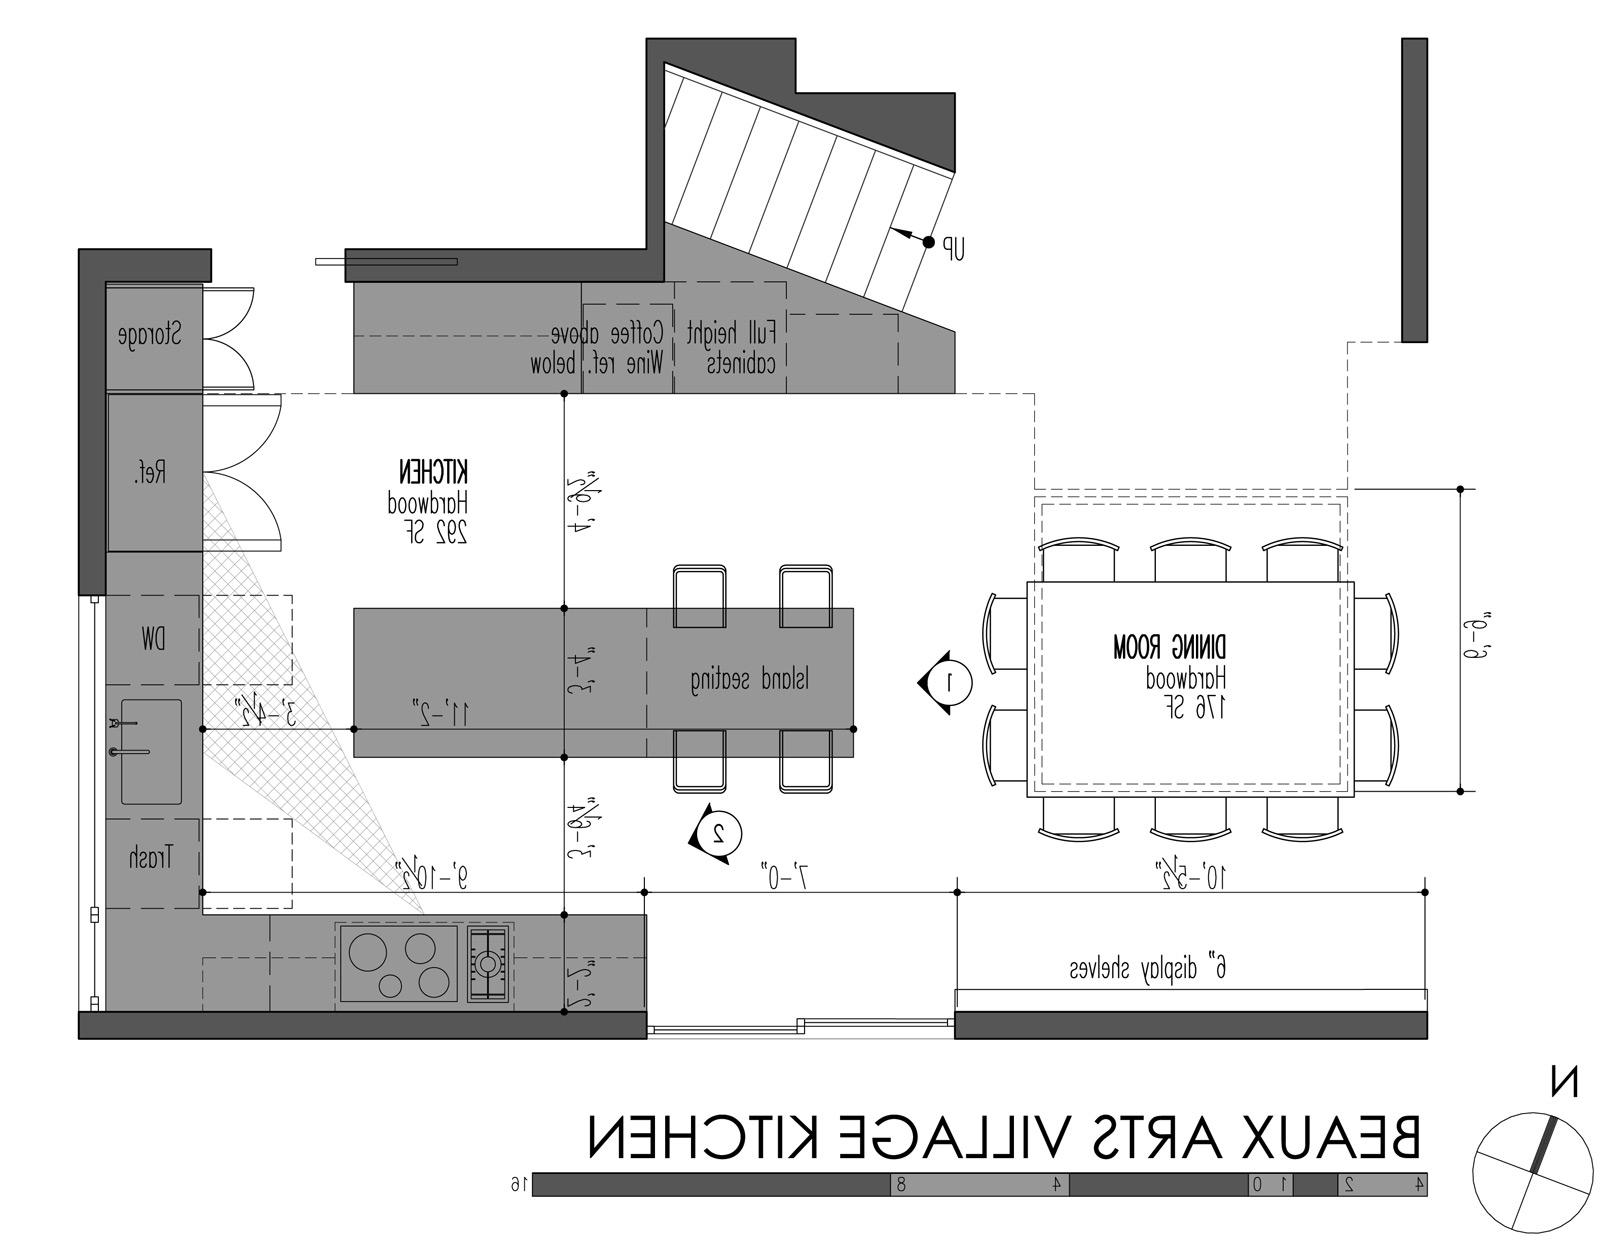 Kitchen Arts Archicad Cad Autocad Drawing Plan Portfolio Blueprint Inspiration Design Ideas Village Kitchen Plan The Philosophy Of Online Kitchen Layout (Image 22 of 38)